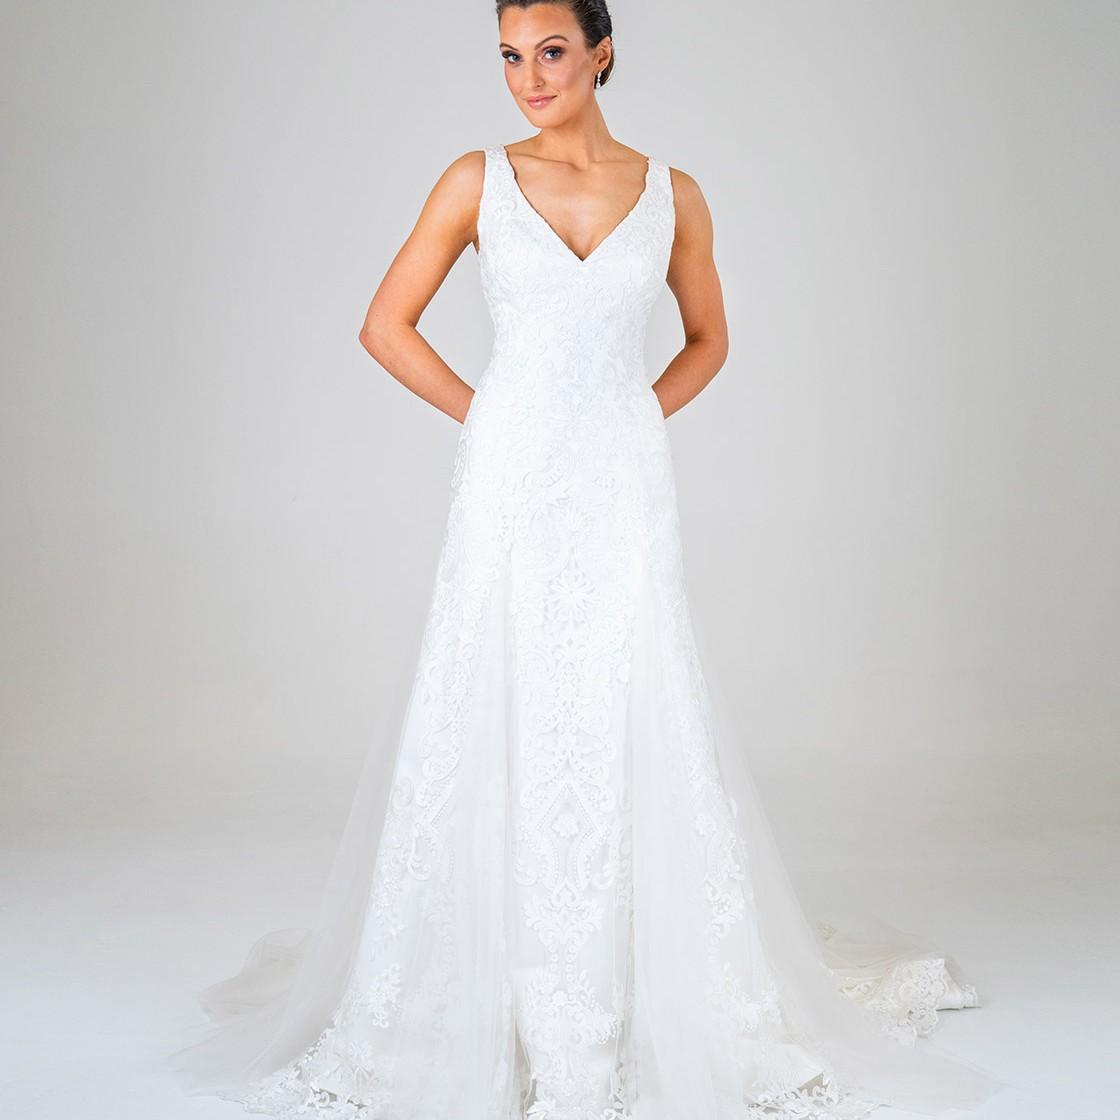 Leila wedding dress front